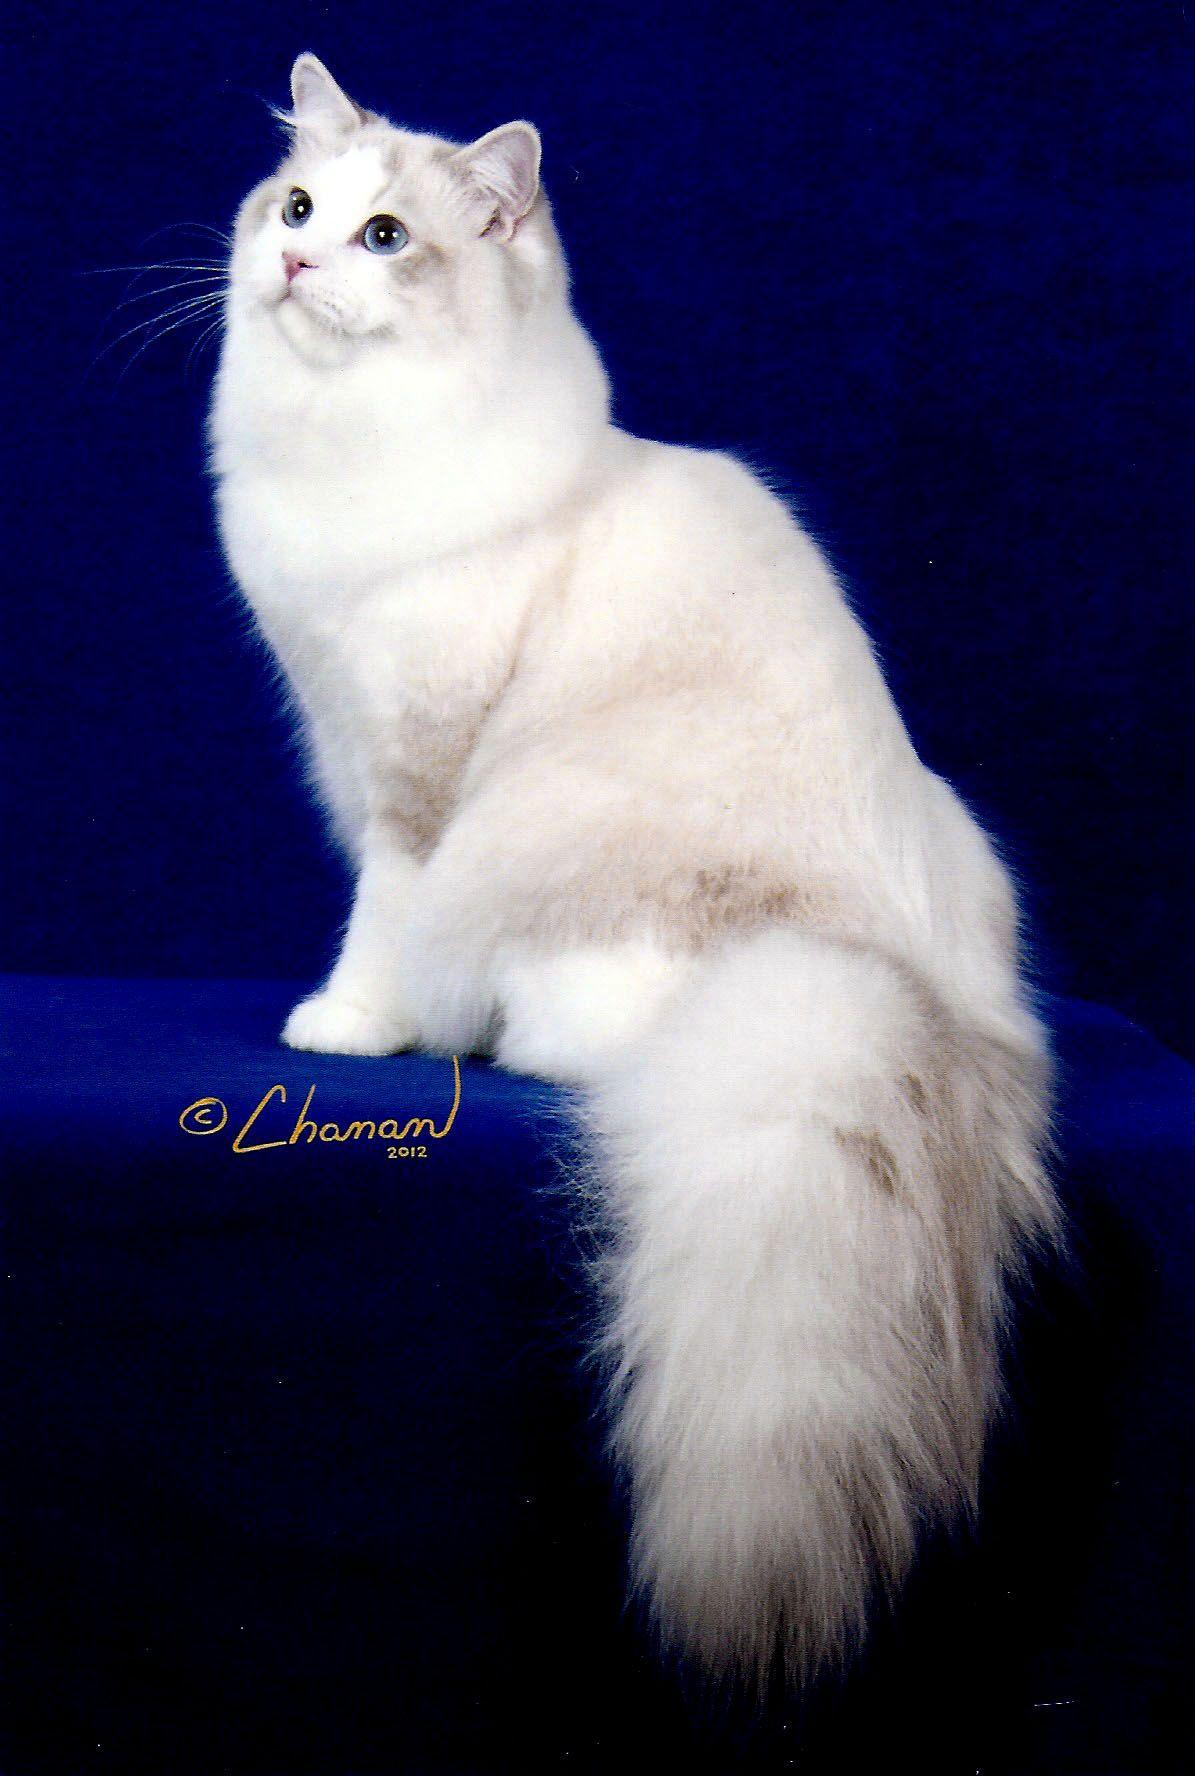 Pin By Sally Johnson On Besto Ragdoll Cat Breeders Ragdoll Cat Cats And Kittens